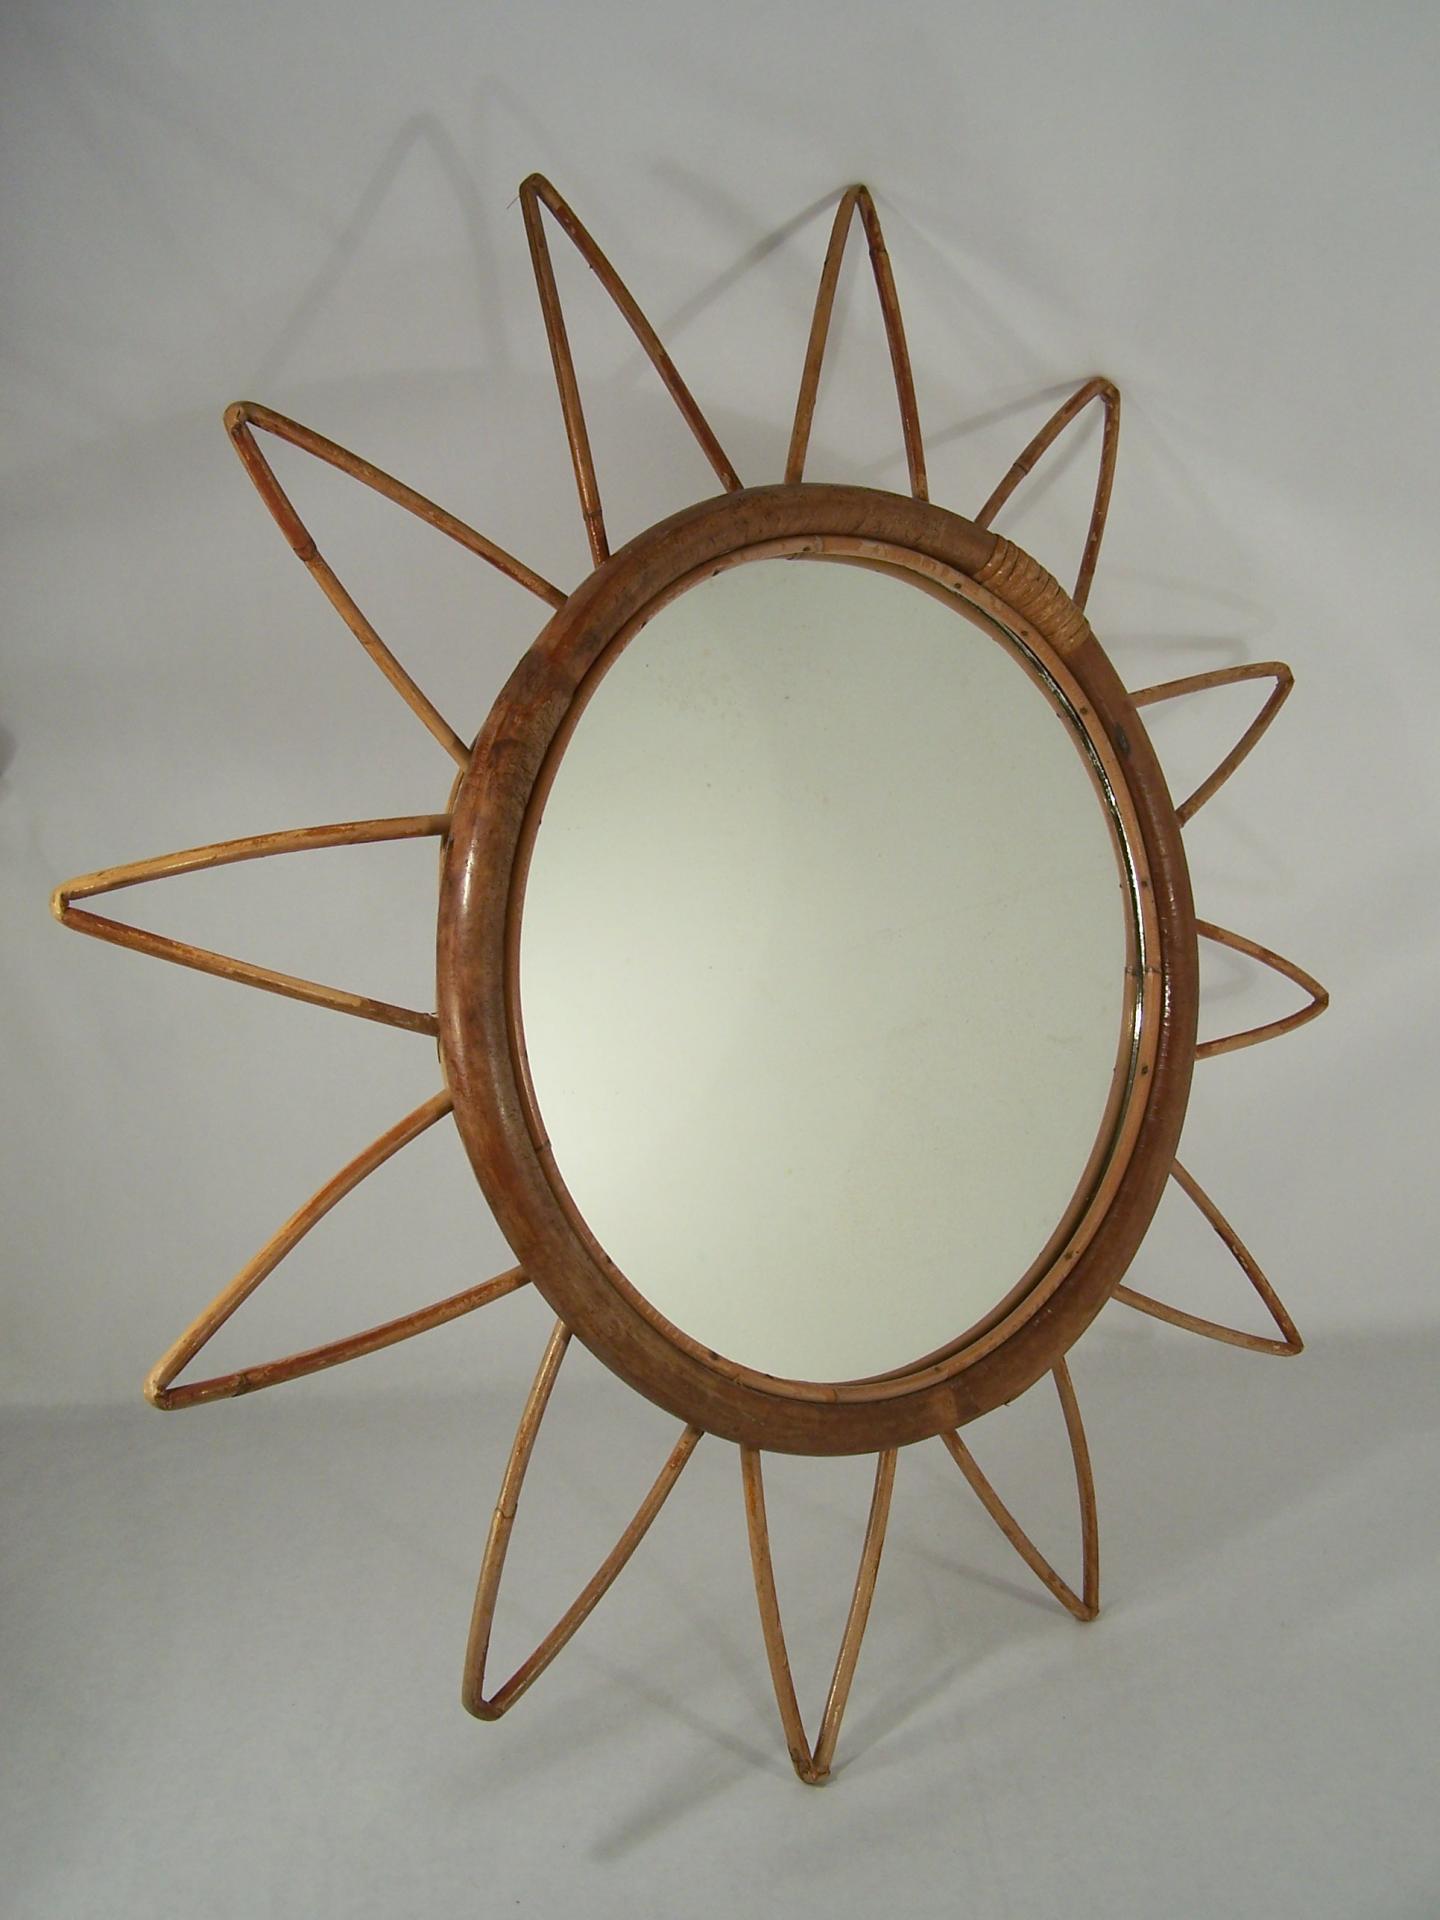 Miroir soleil vintage miroir en osier miroir en rotin for Miroir soleil osier